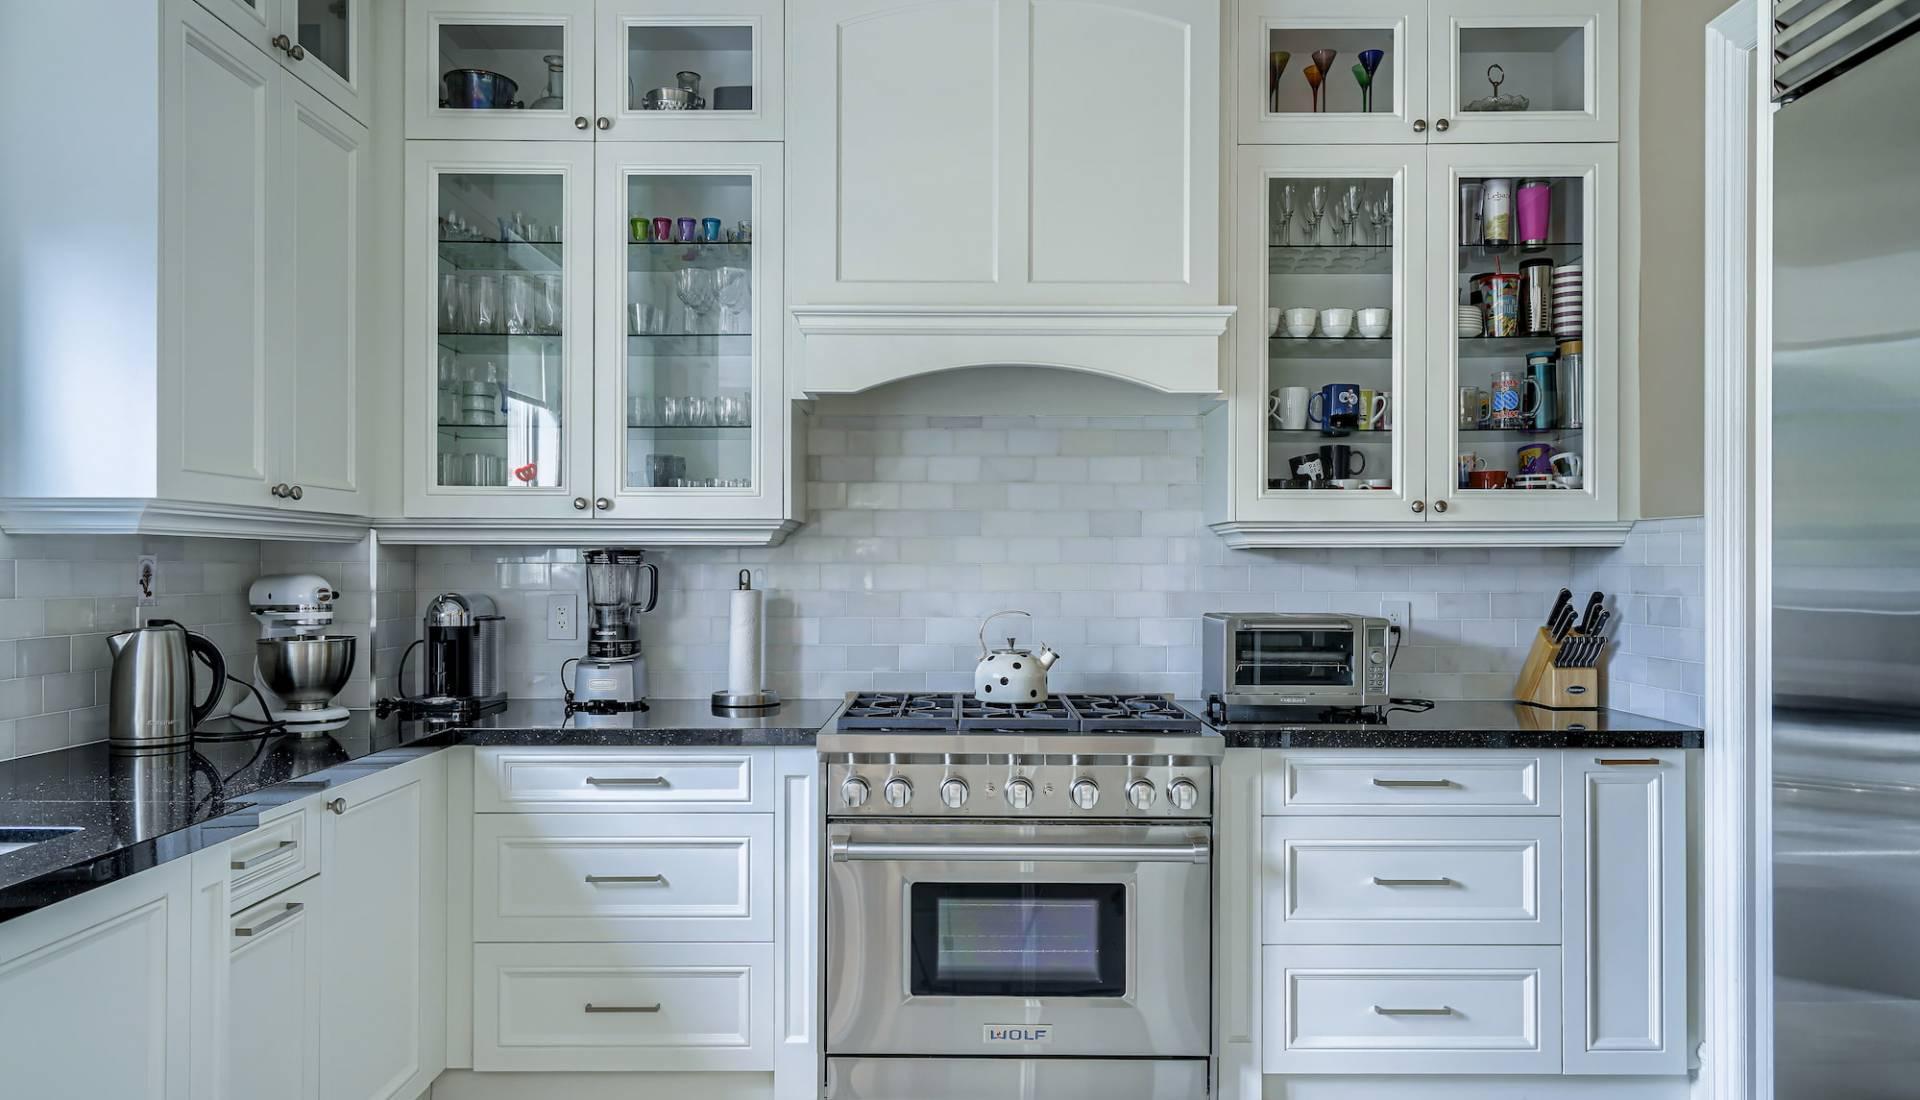 Used Kitchen Cabinets Buffalo Ny - Kitchen Cabinet Paint ...